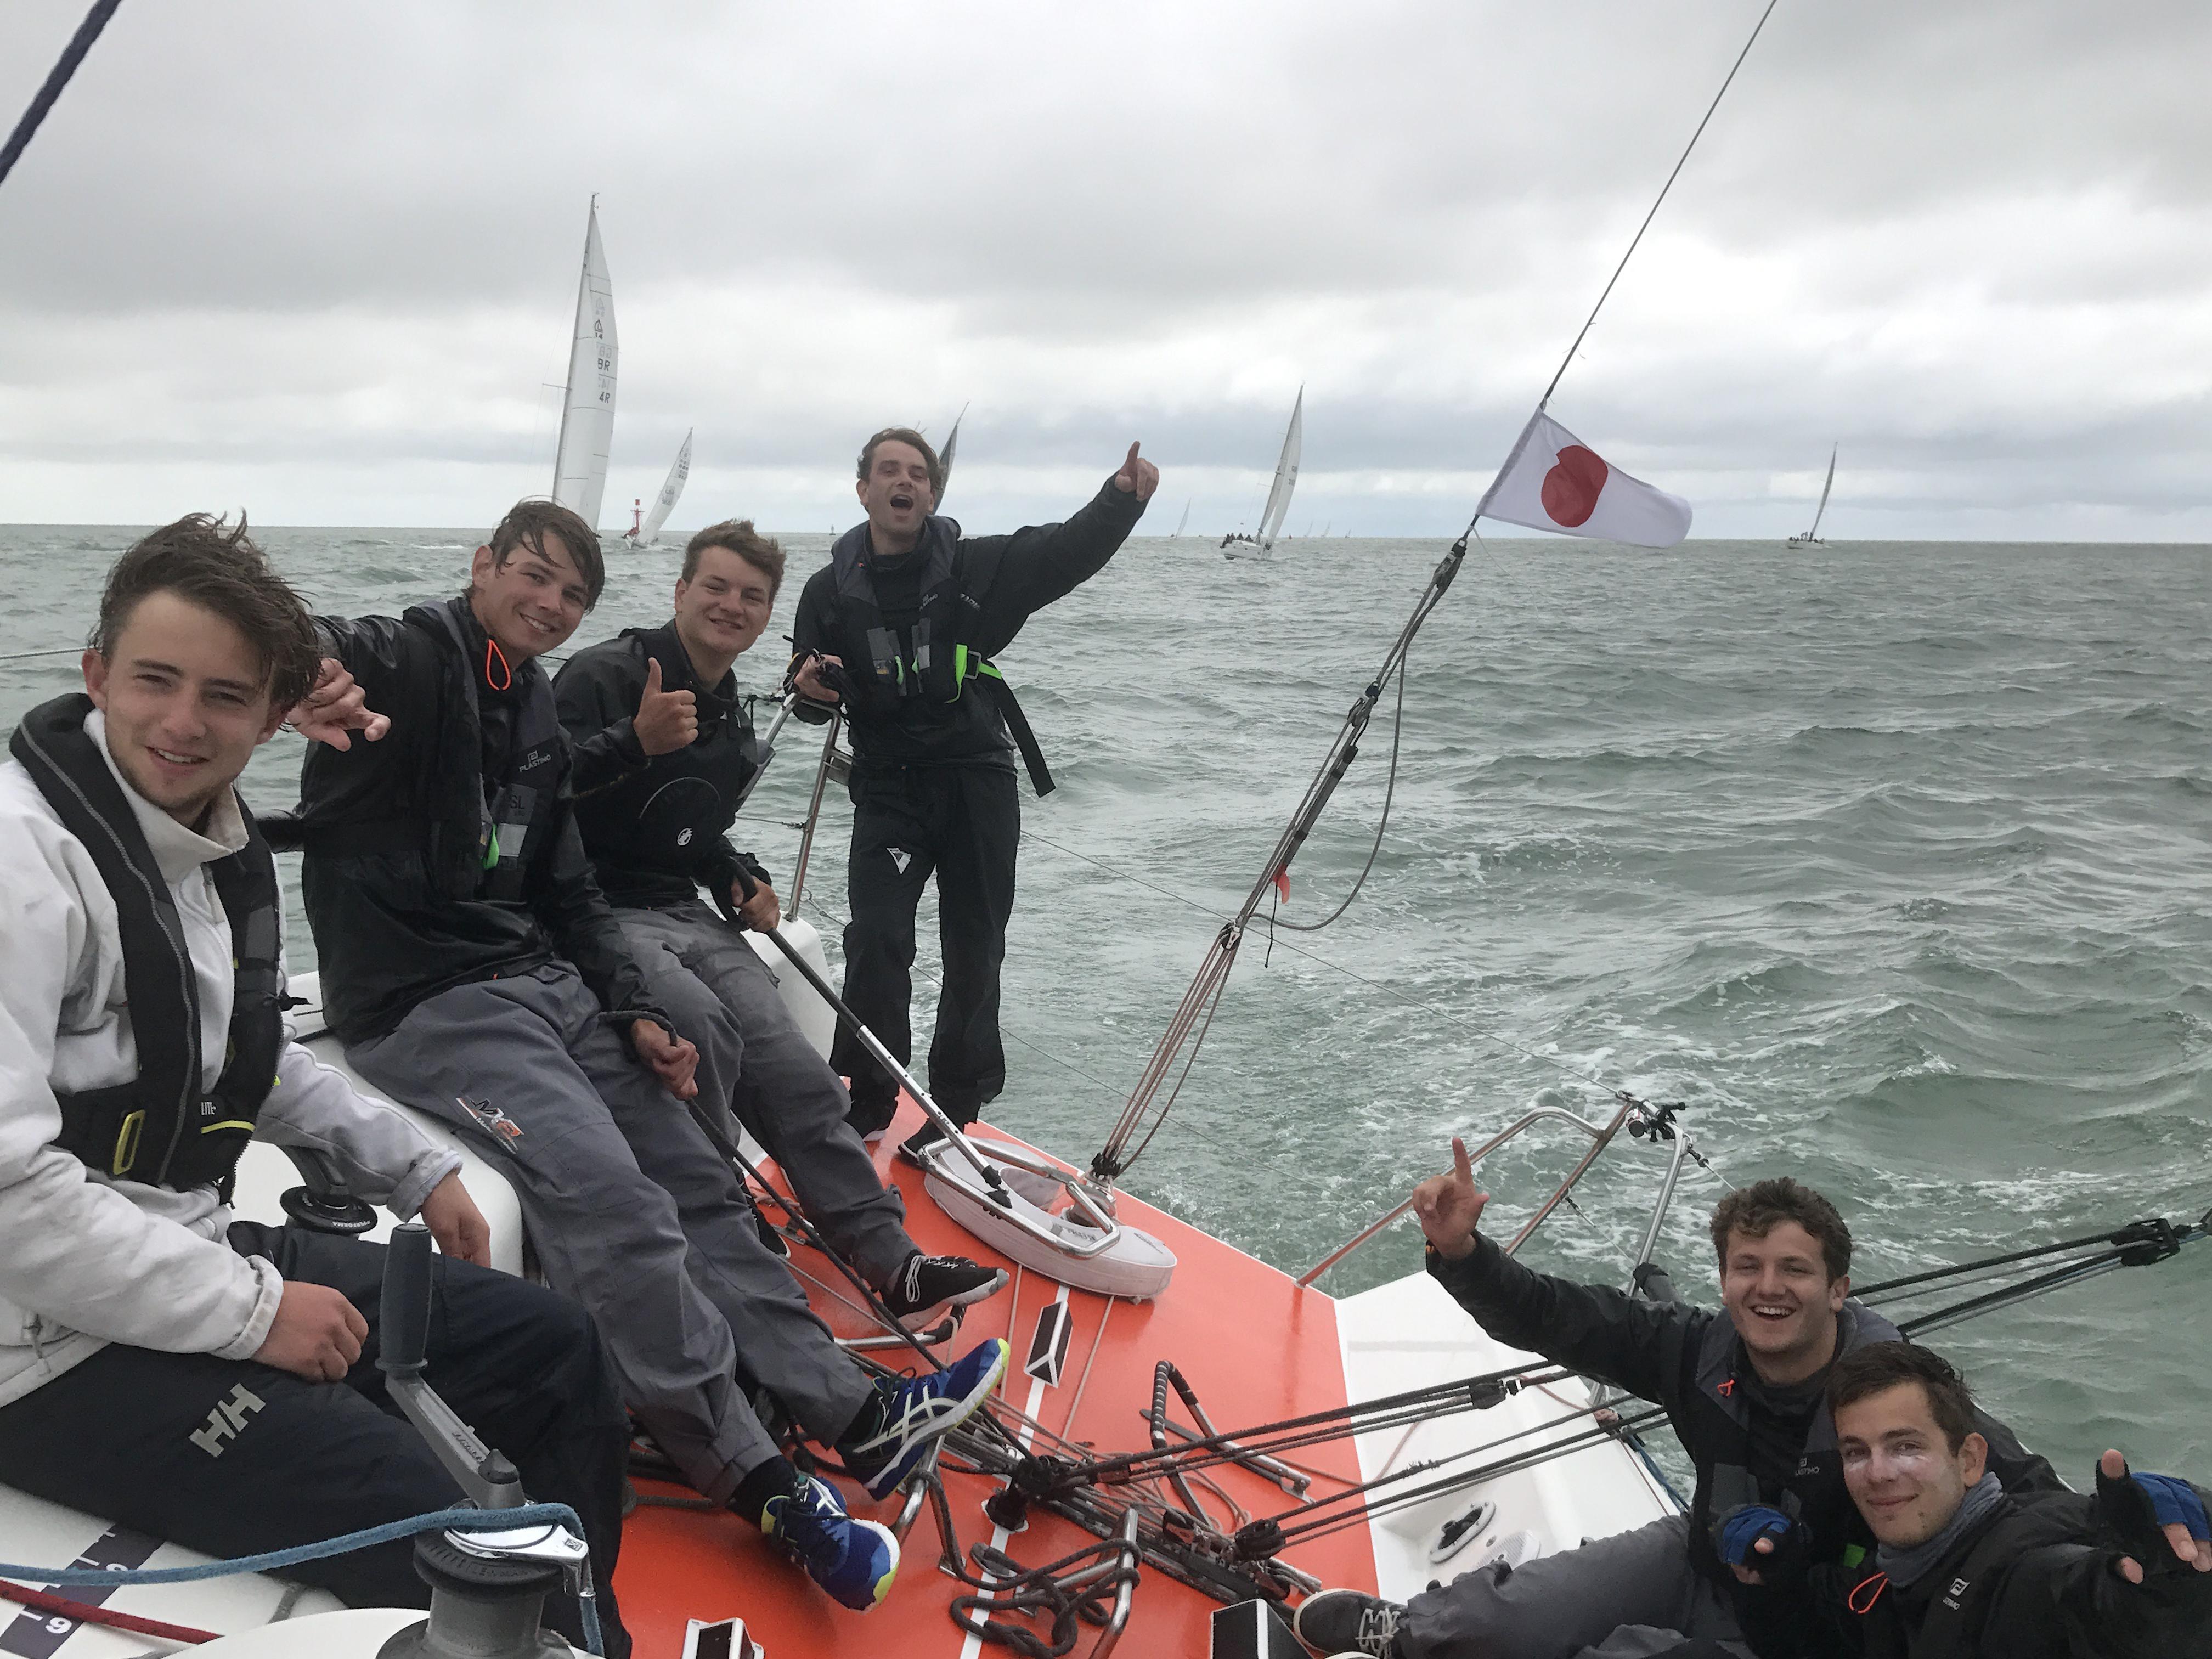 Team Delft Challenge: Succes in Ramsgate